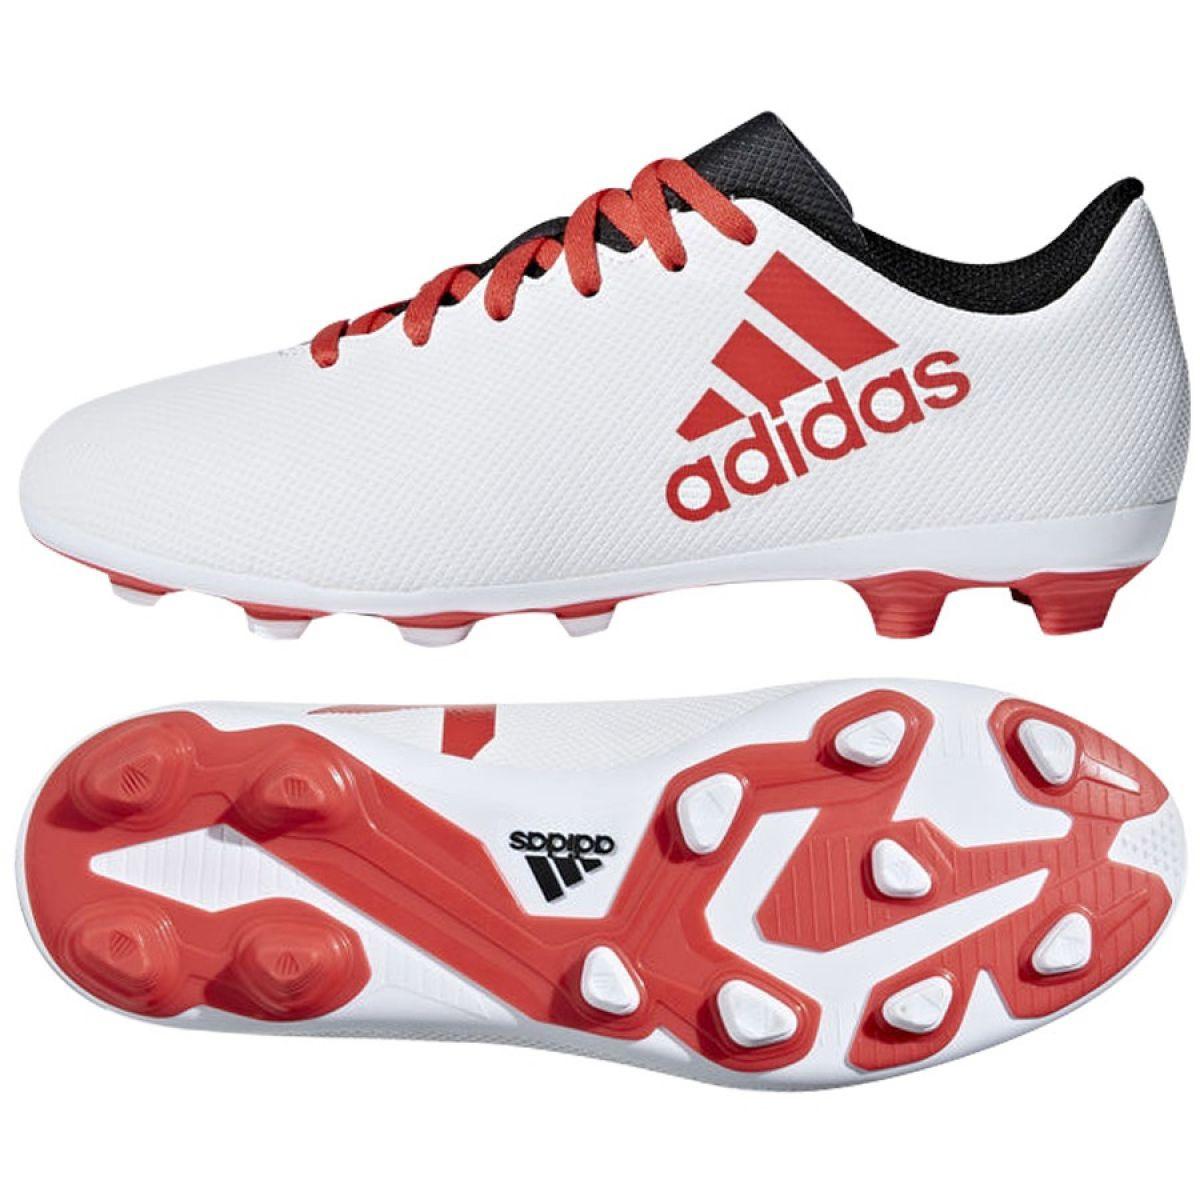 best website eb5f6 6692f Football shoes adidas X 17.4 FxG Jr CP9015